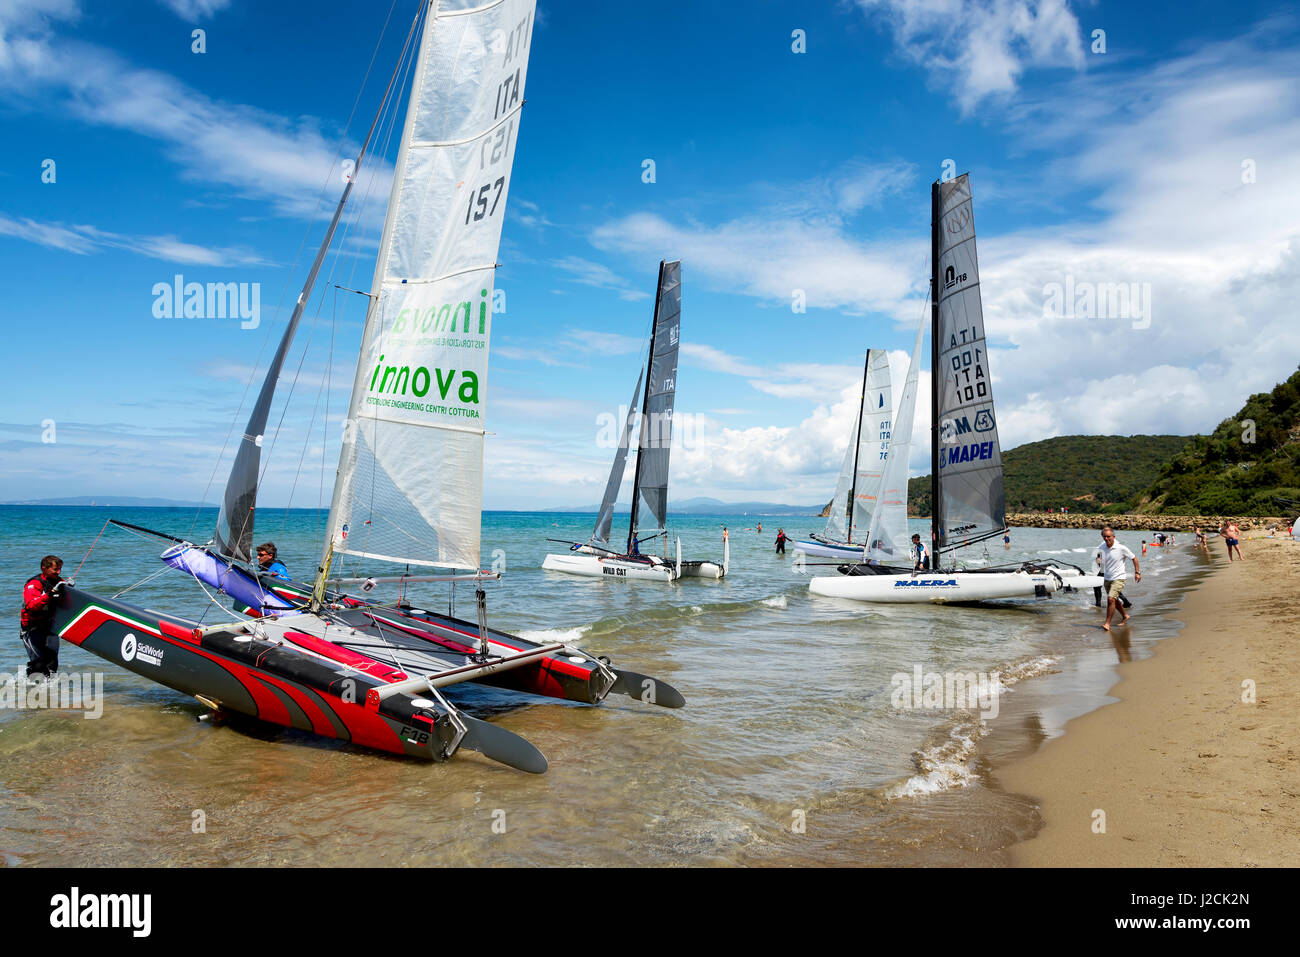 PUNTA ALA - 3 JUNE: teams sailing on Formula 18 national catamaran race, on June 3 2016 in Punta Ala, Italy Stock Photo